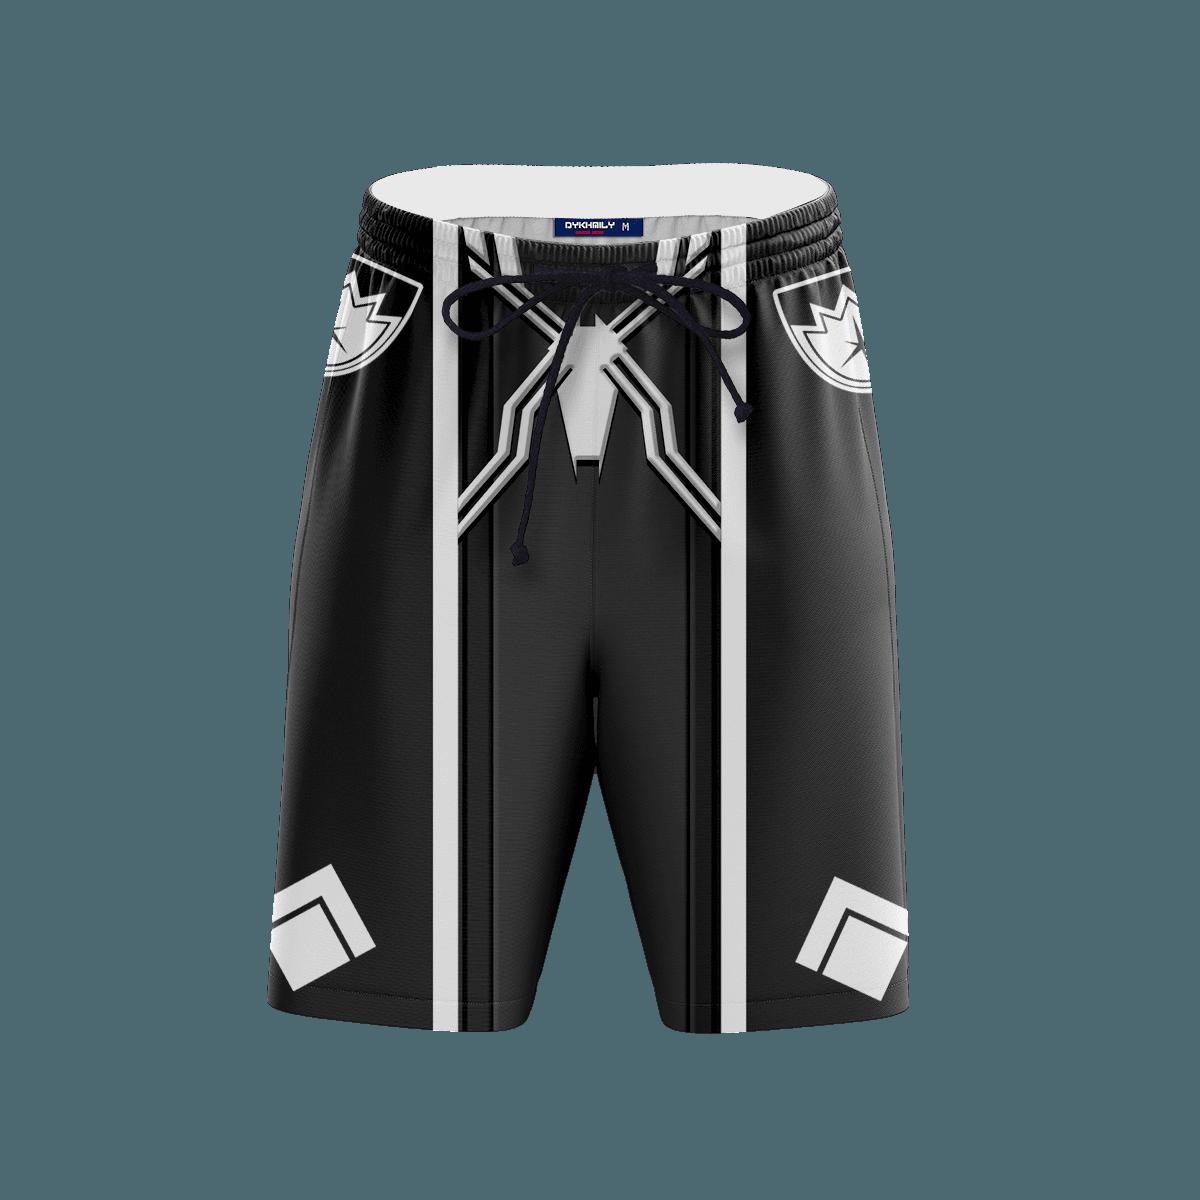 All New Venom Beach Shorts FDM3107 S Official Anime Swimsuit Merch